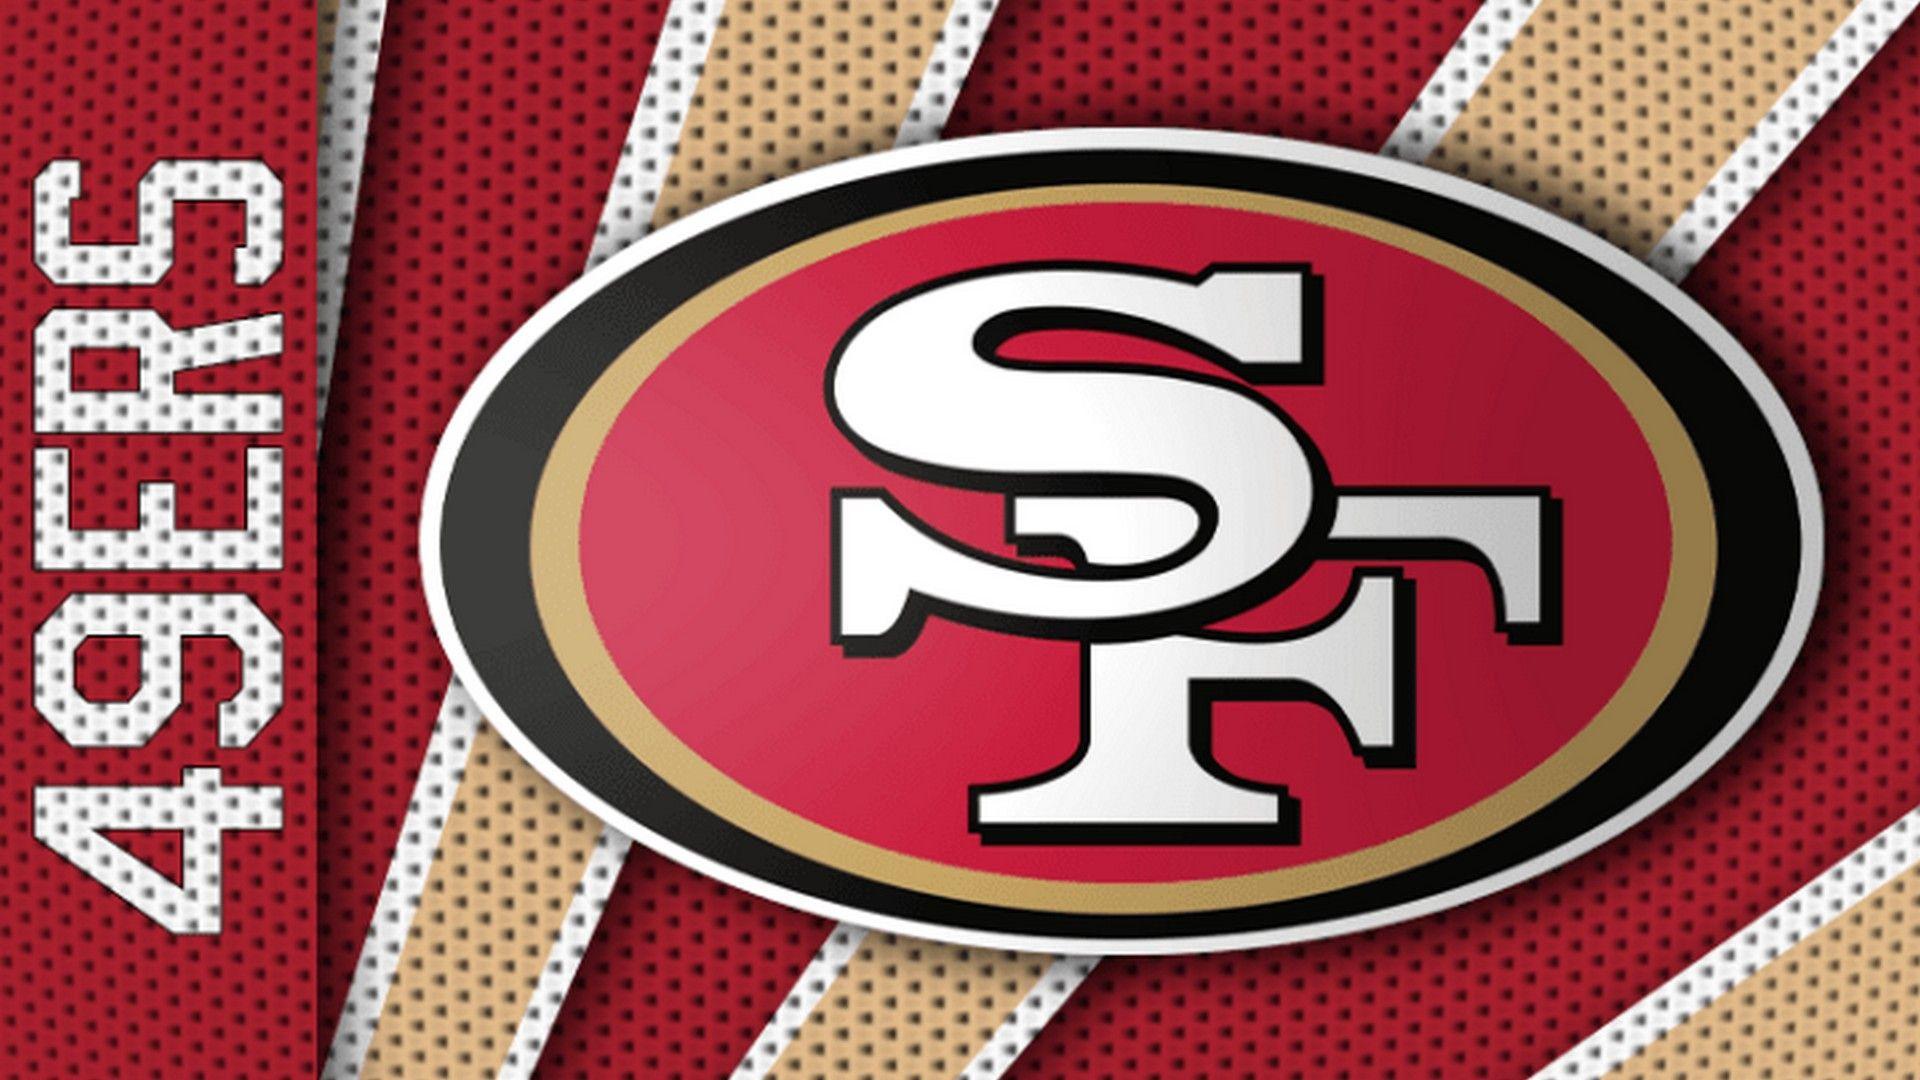 HD San Francisco 49ers Wallpapers Football wallpaper